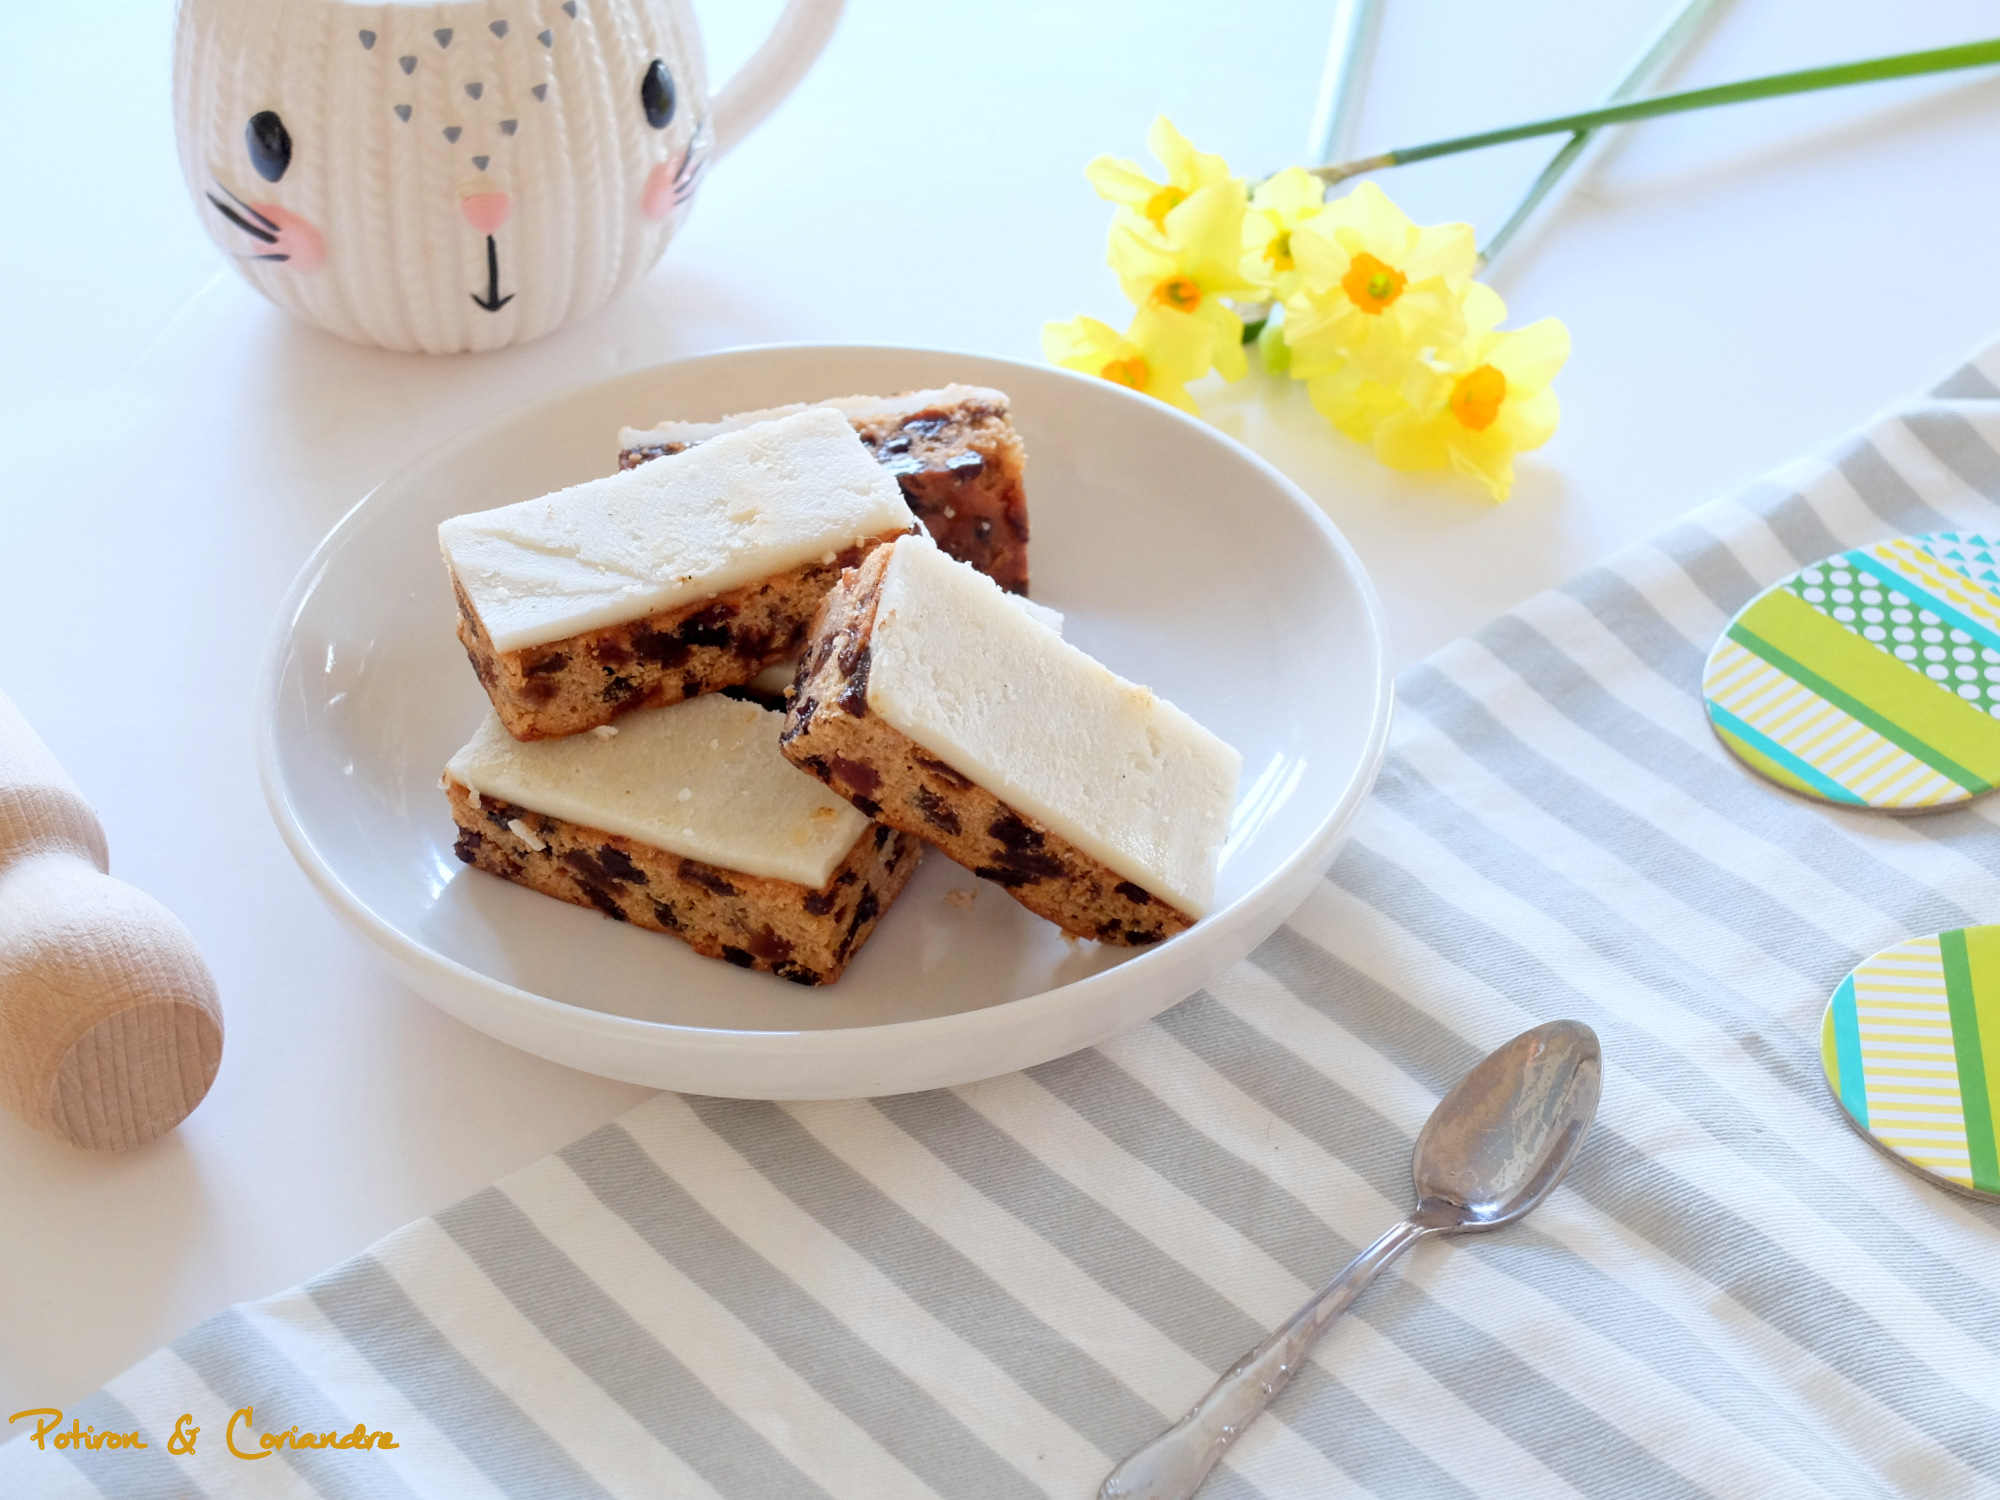 Cake aux fruits façon Simnel cake